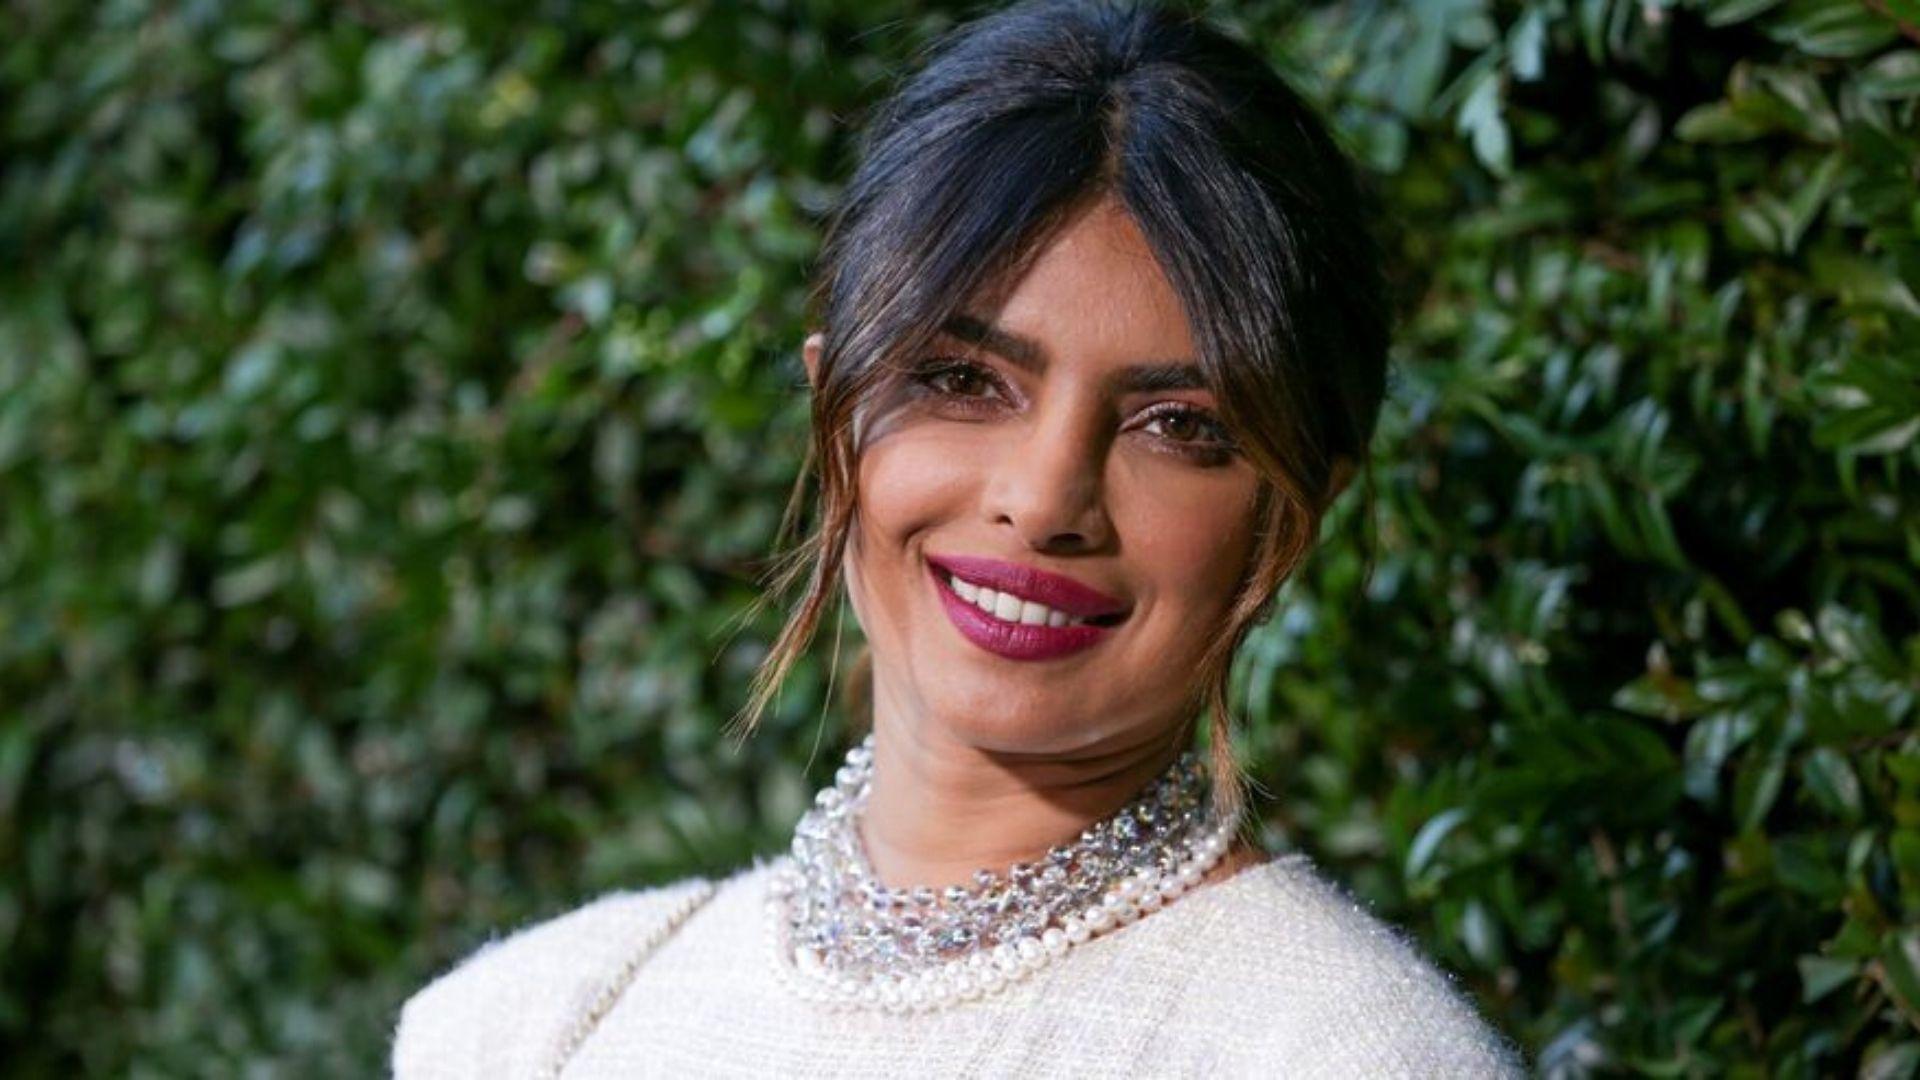 Priyanka Chopra Stole The Show Wearing A Lebanese Designer Gown At The 2020 Pre-Grammy Gala